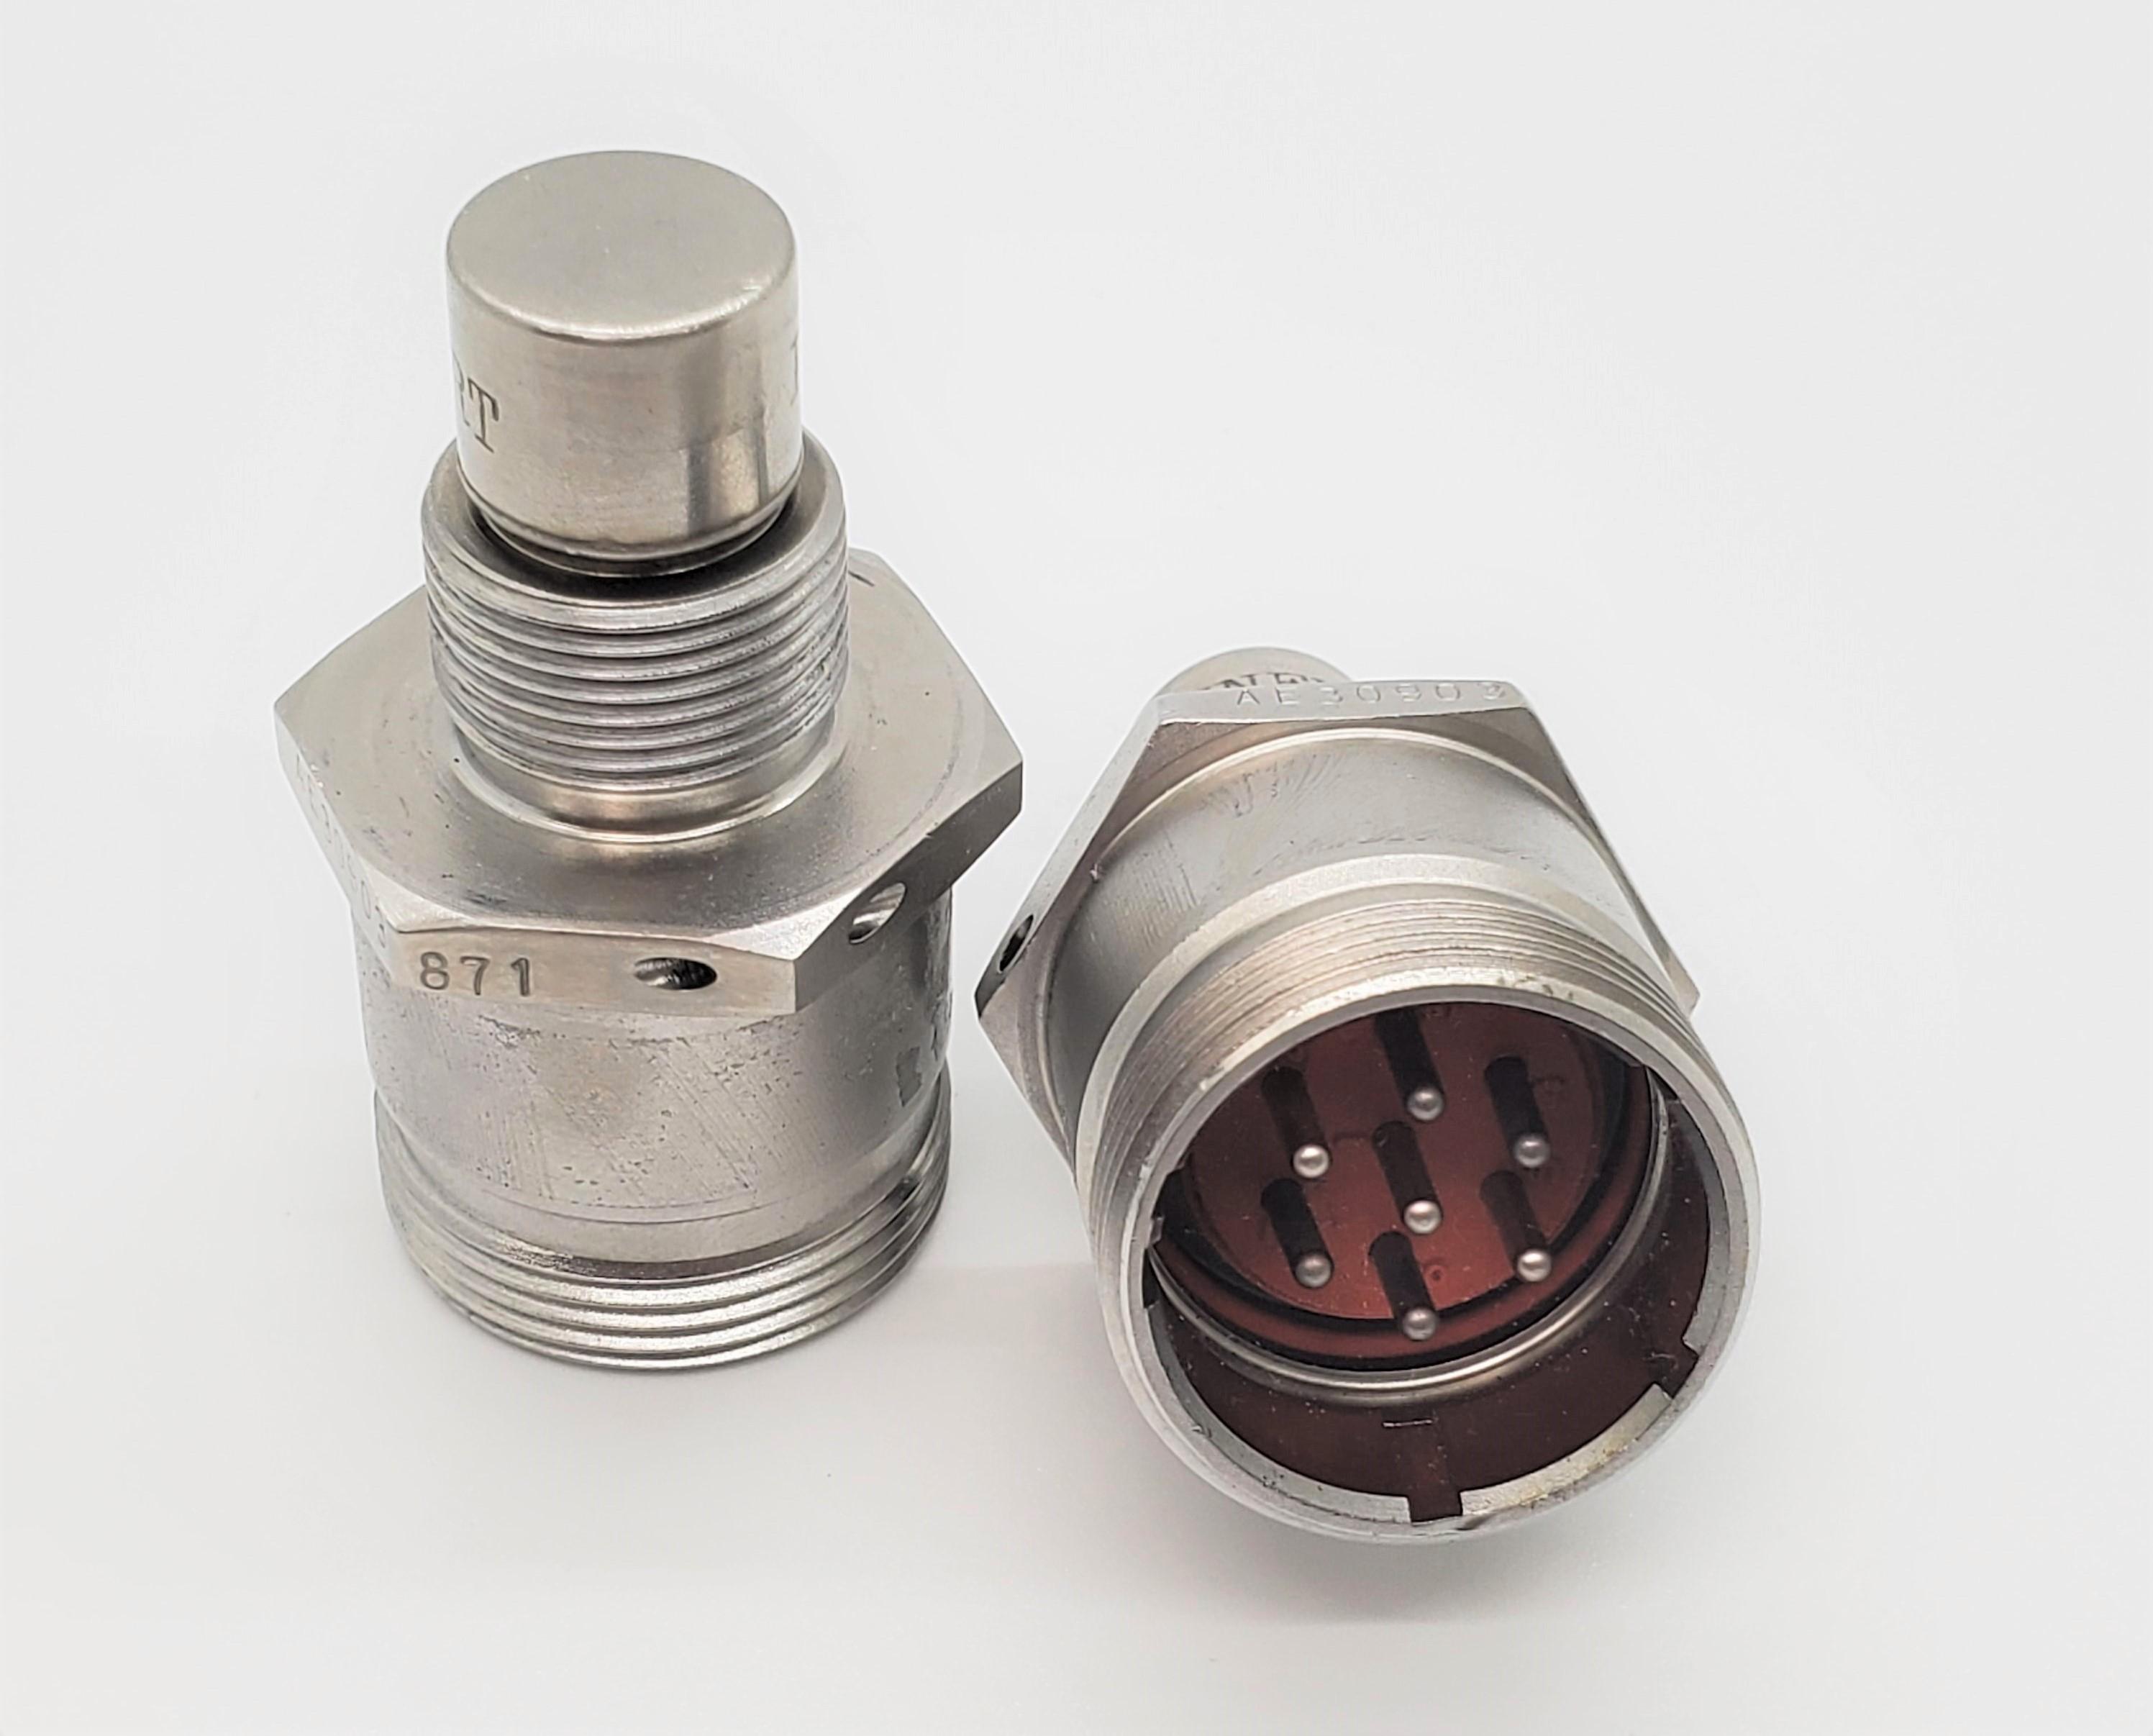 Extinguisher squibs